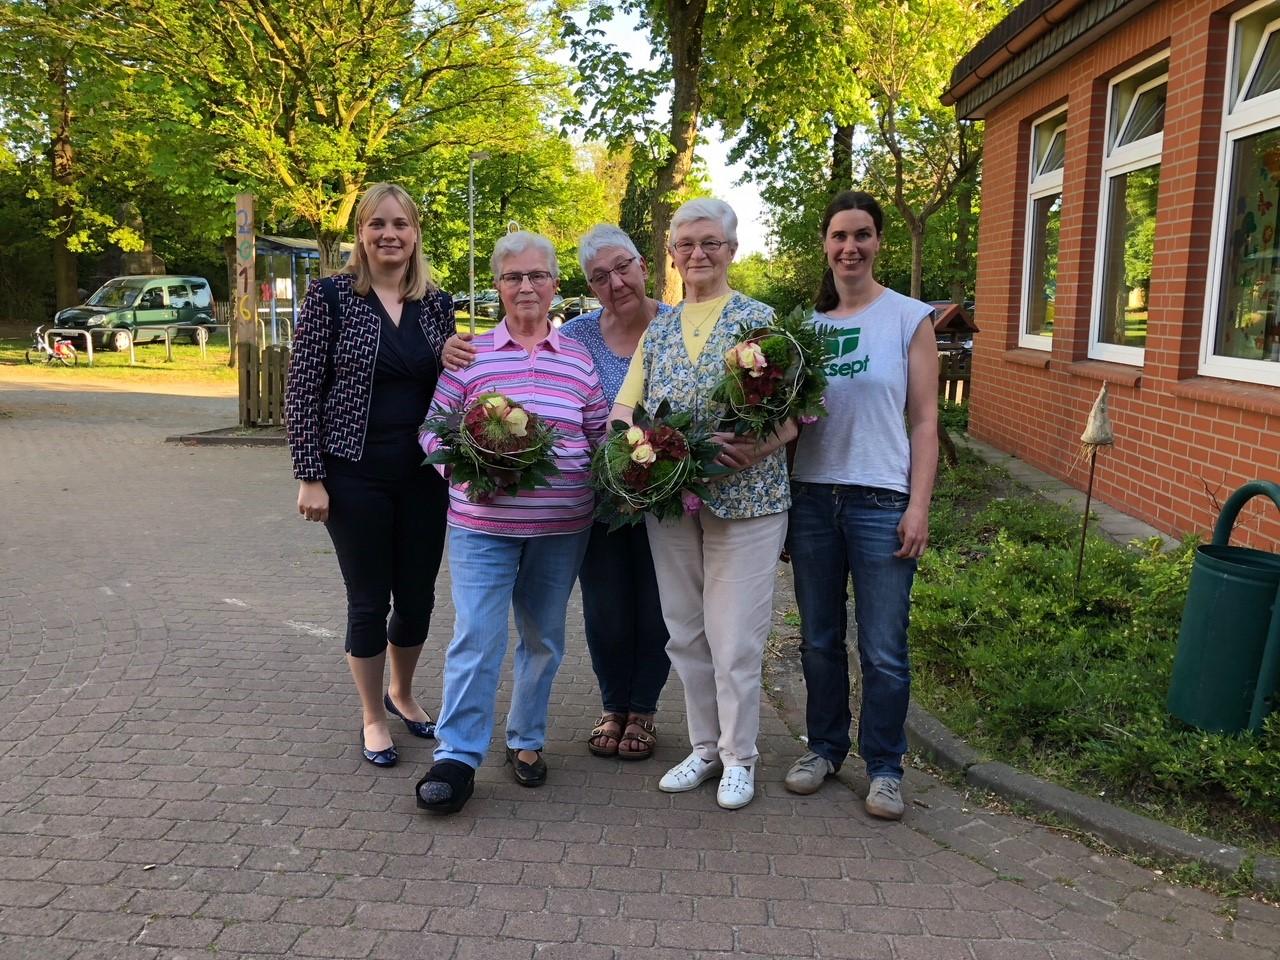 Marja-Liisa Völlers, Frieda Küfe, Jutta Witte, Hannah Lesemann, Sabine Kessner-Graue